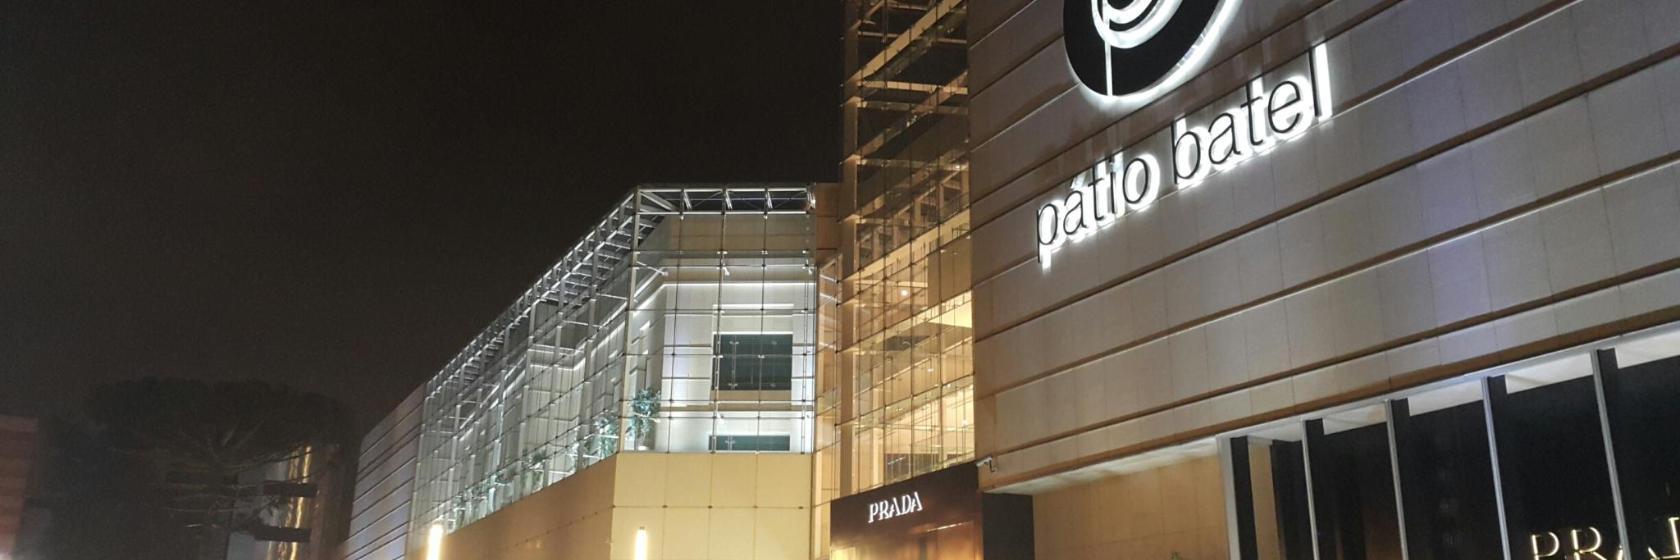 Ang 10 Best Hotel Malapit Sa Novo Batel Mall Sa Curitiba Brazil